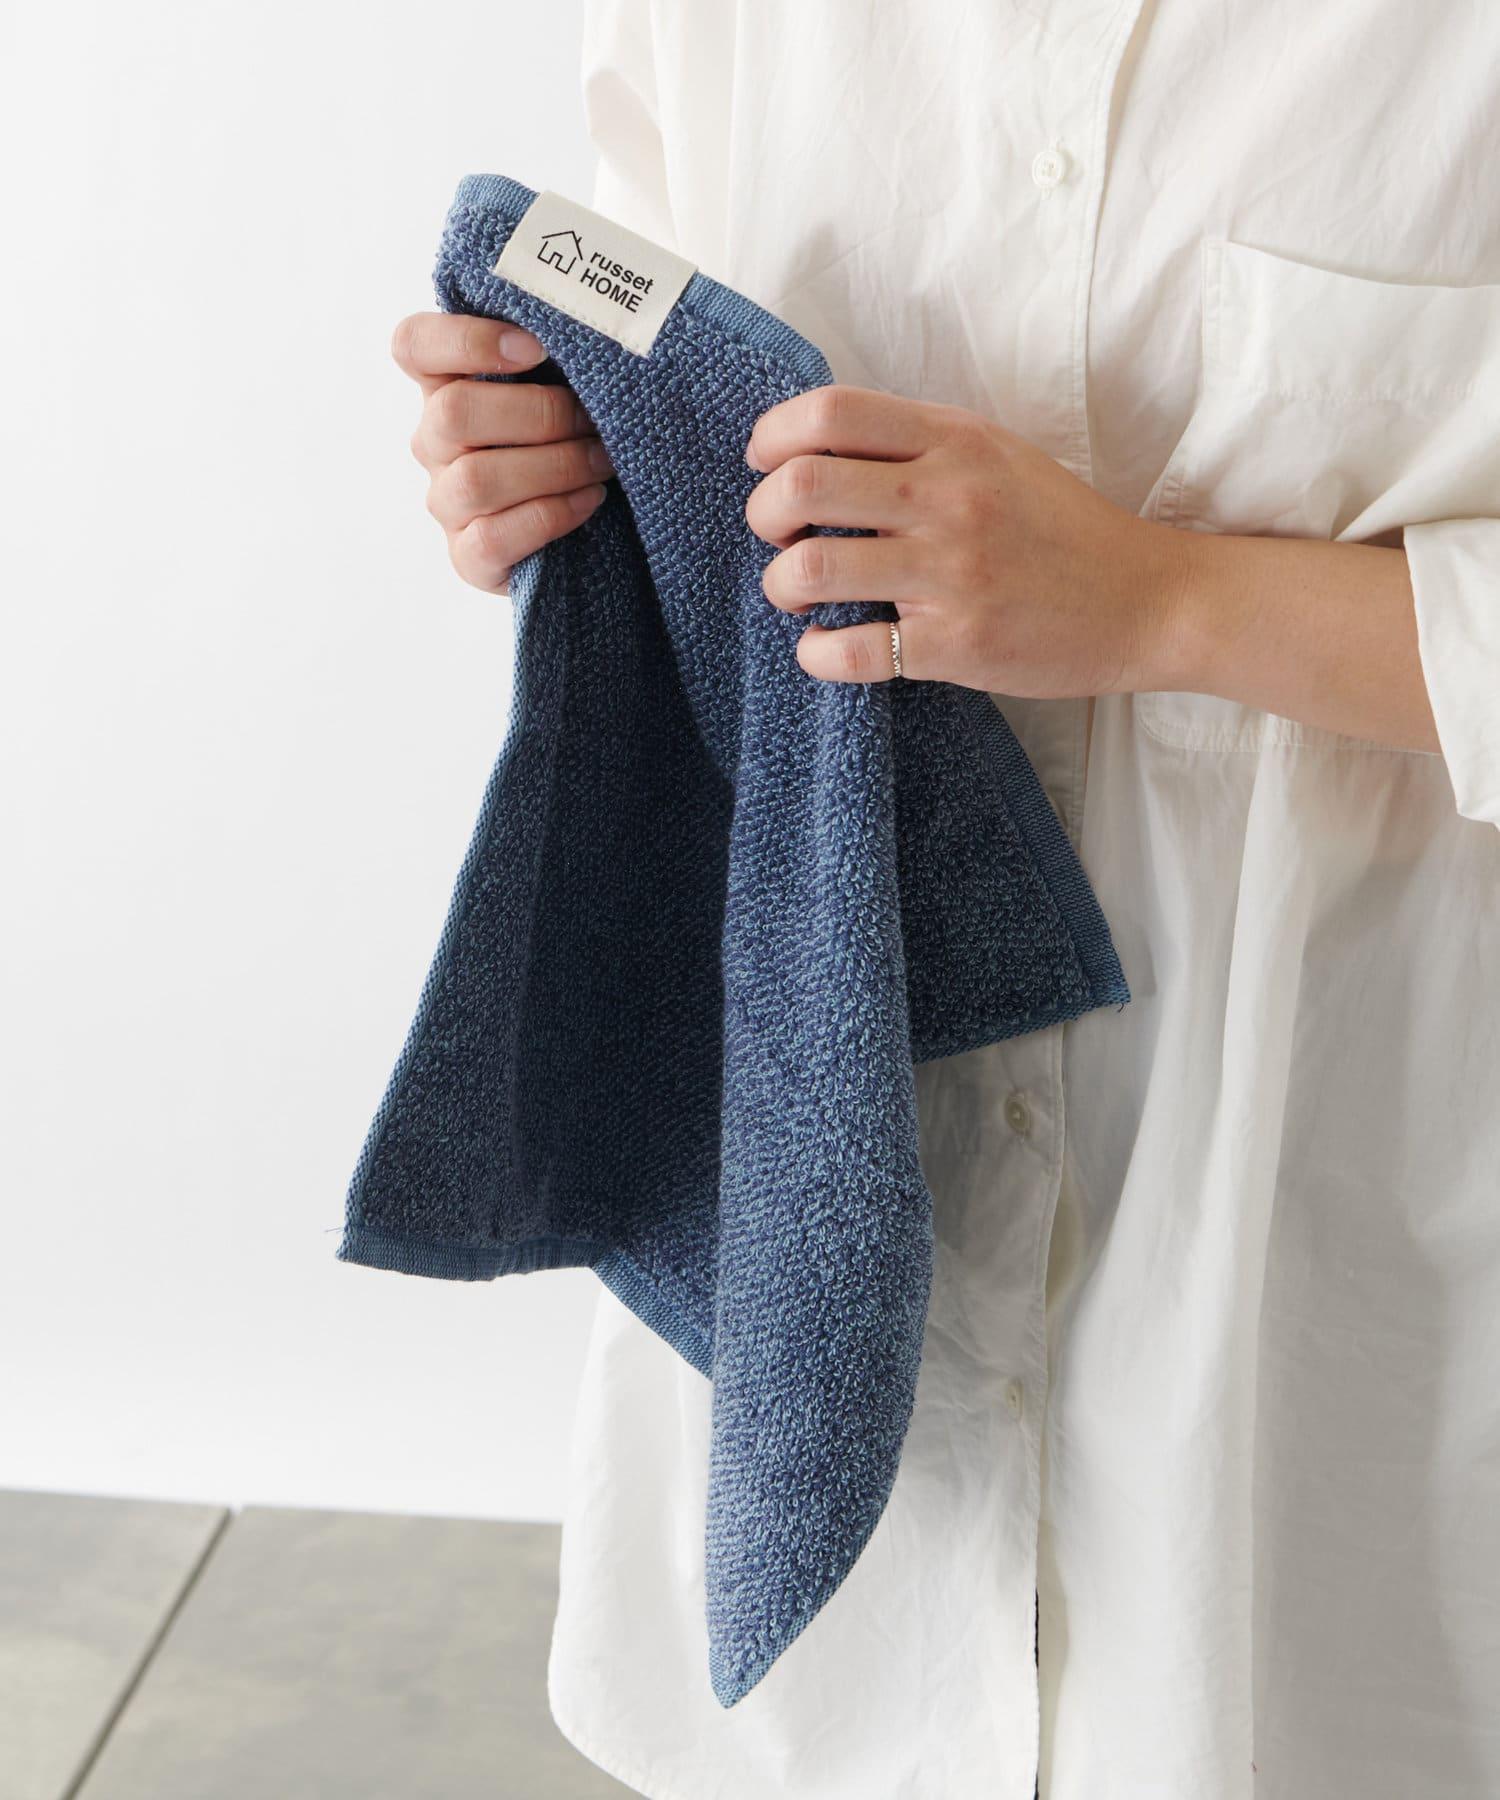 【cocochiena】巾着付きハンドタオル(N-001)